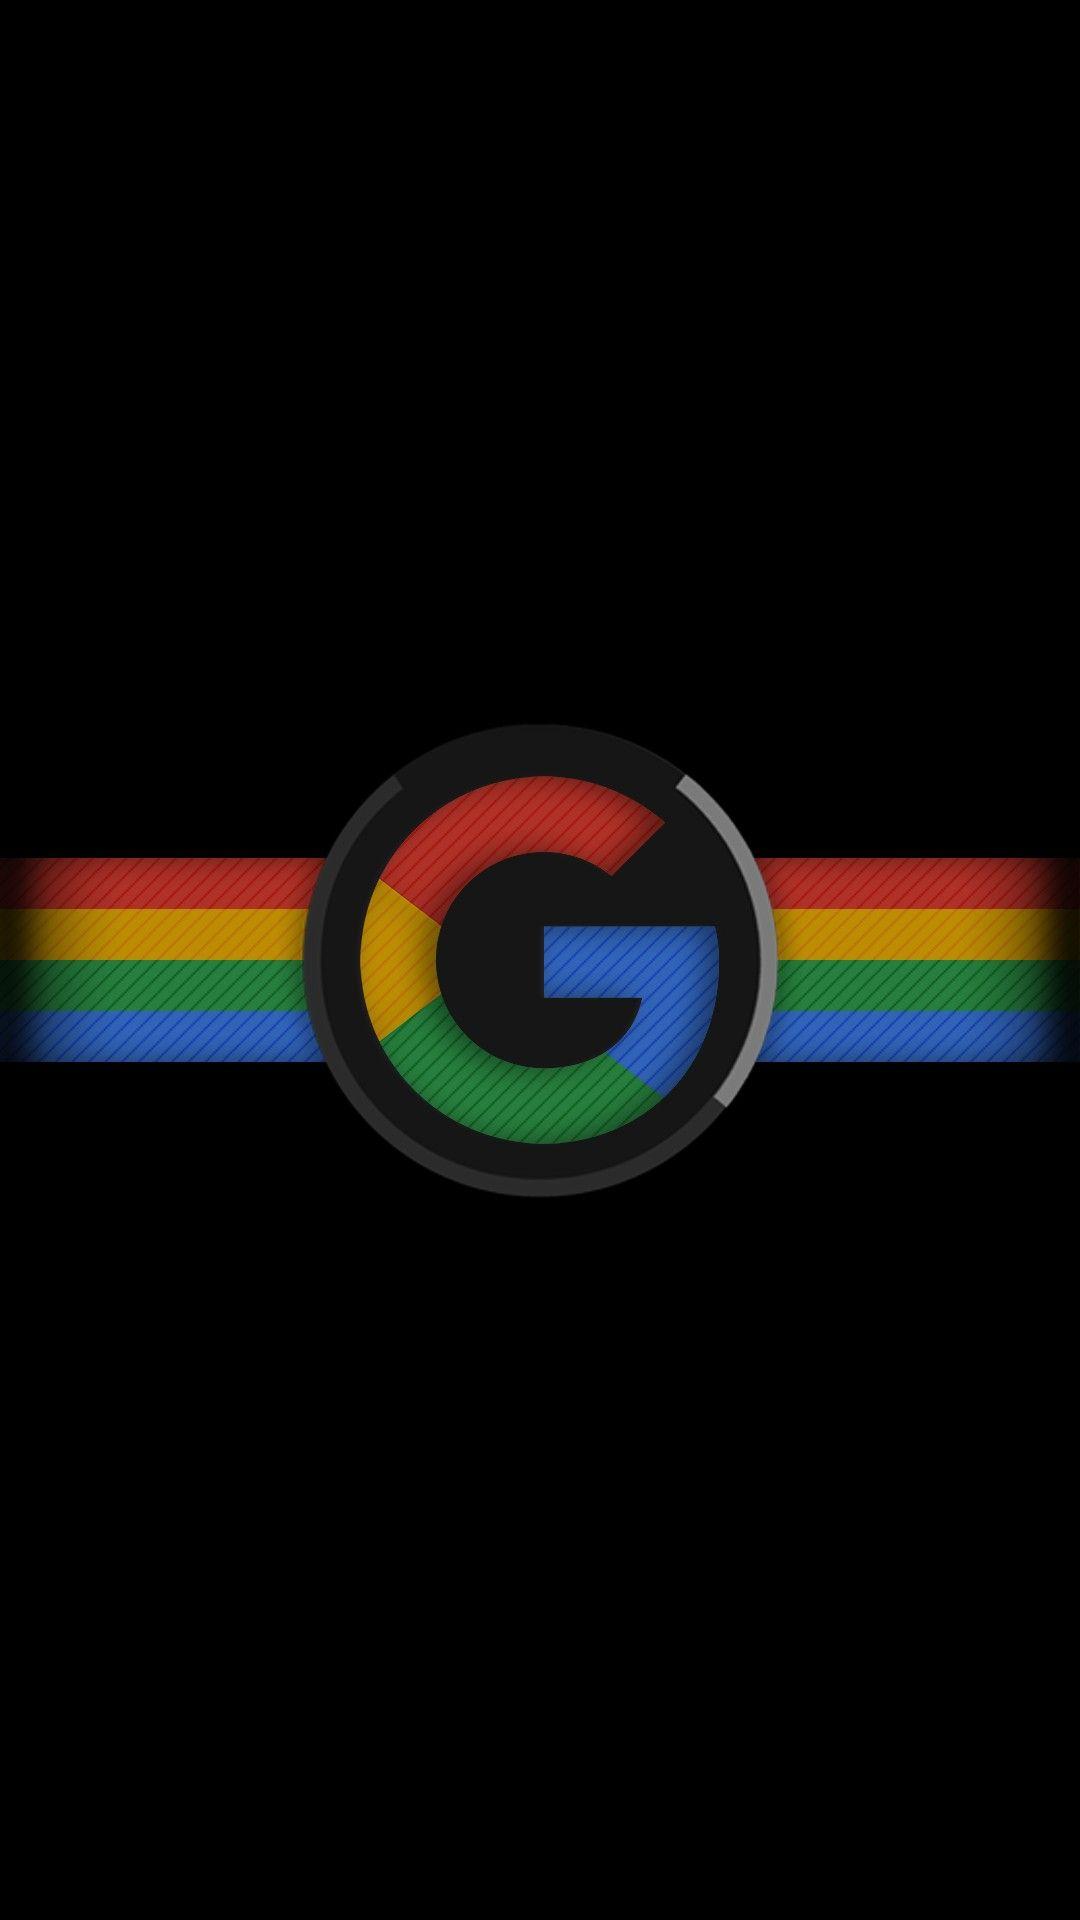 Wallpaper Google Google pixel wallpaper, Android